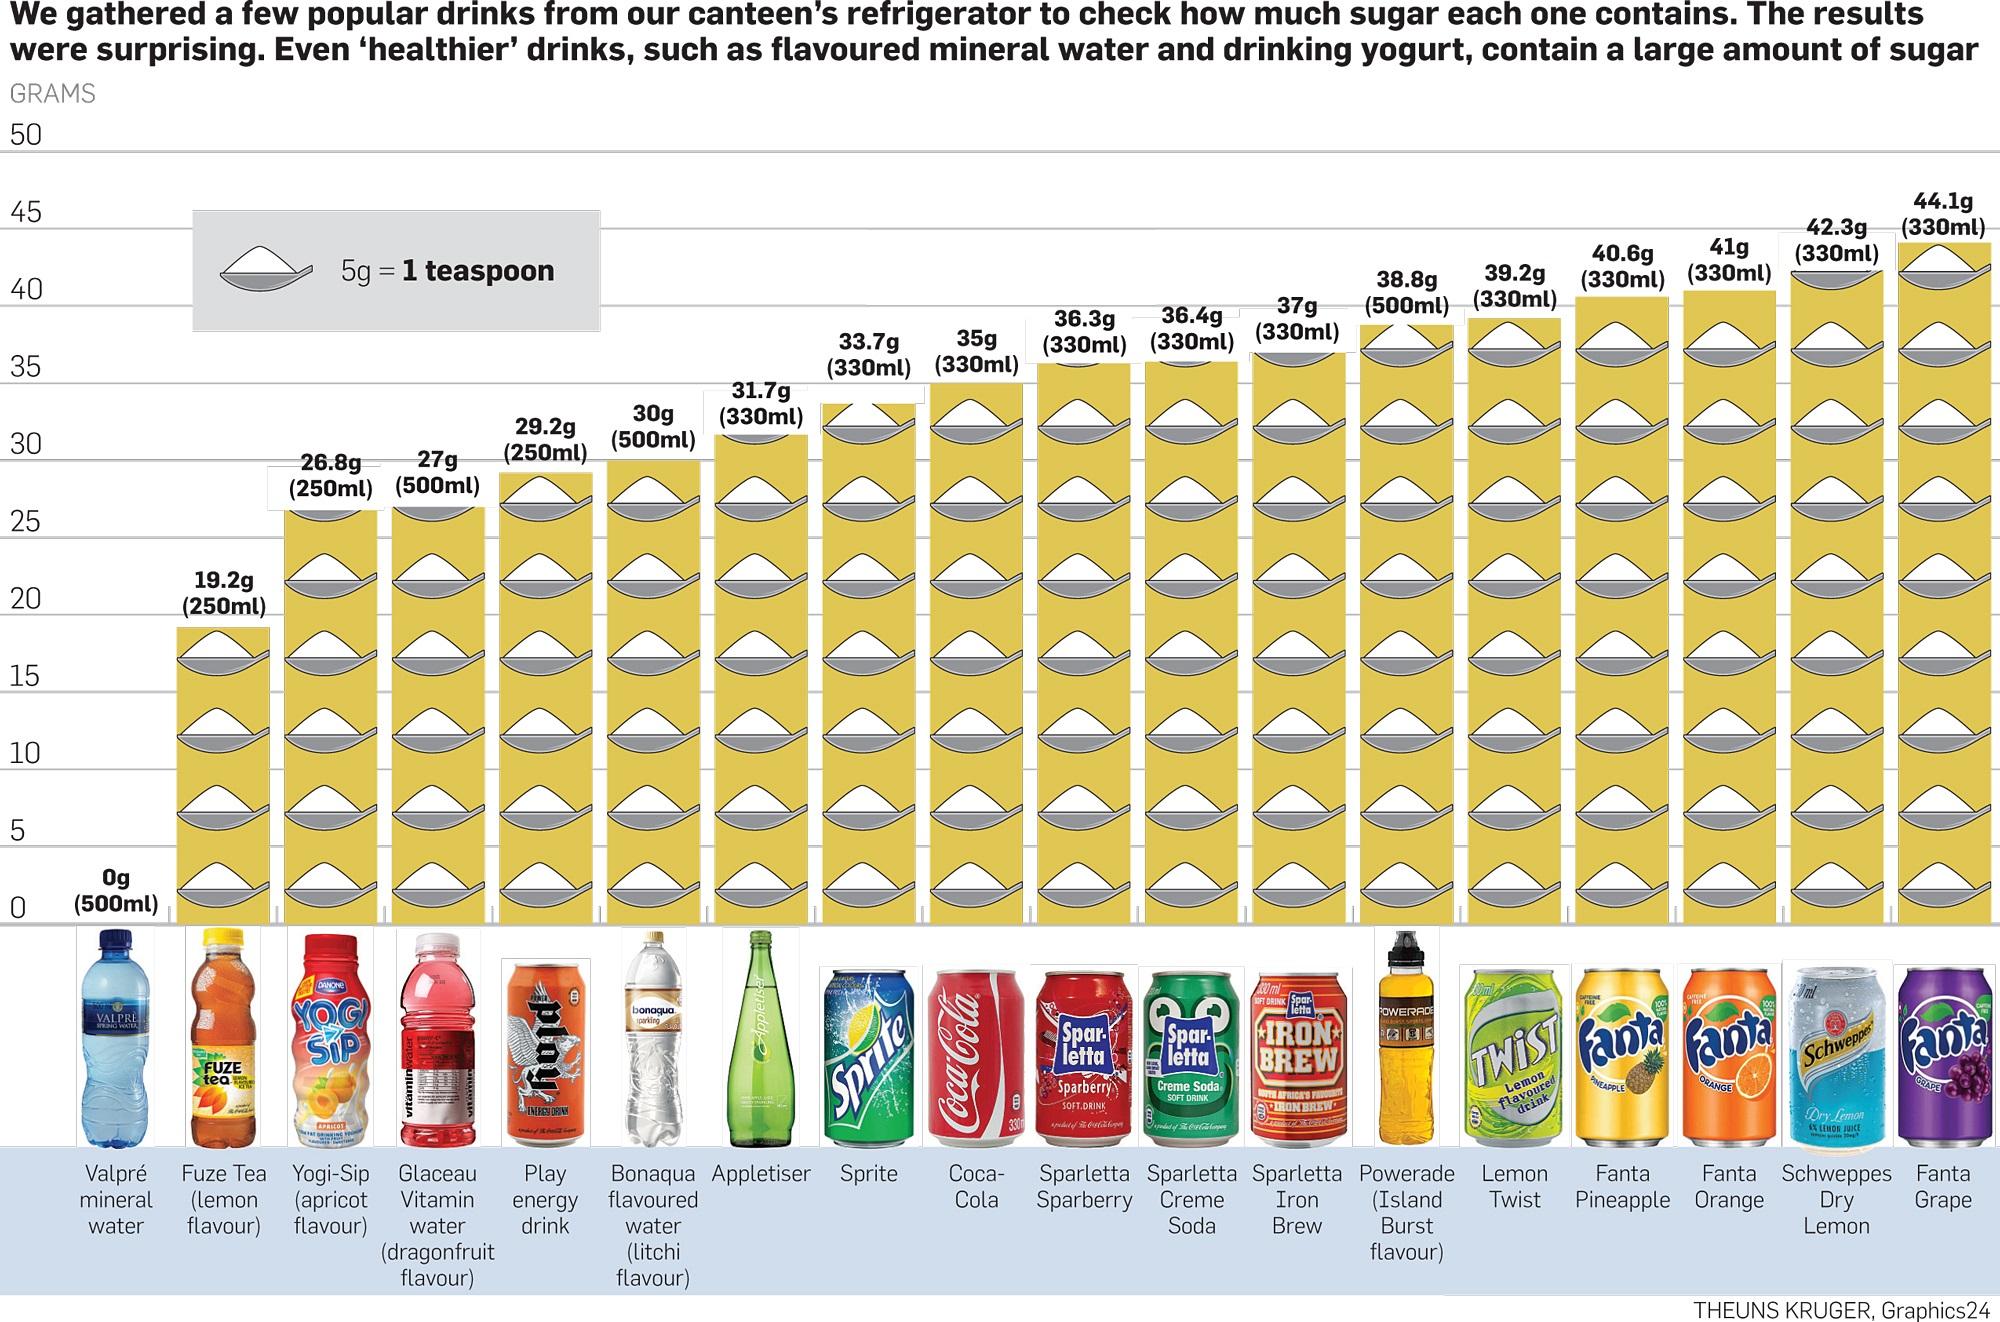 SA's most sugary drinks